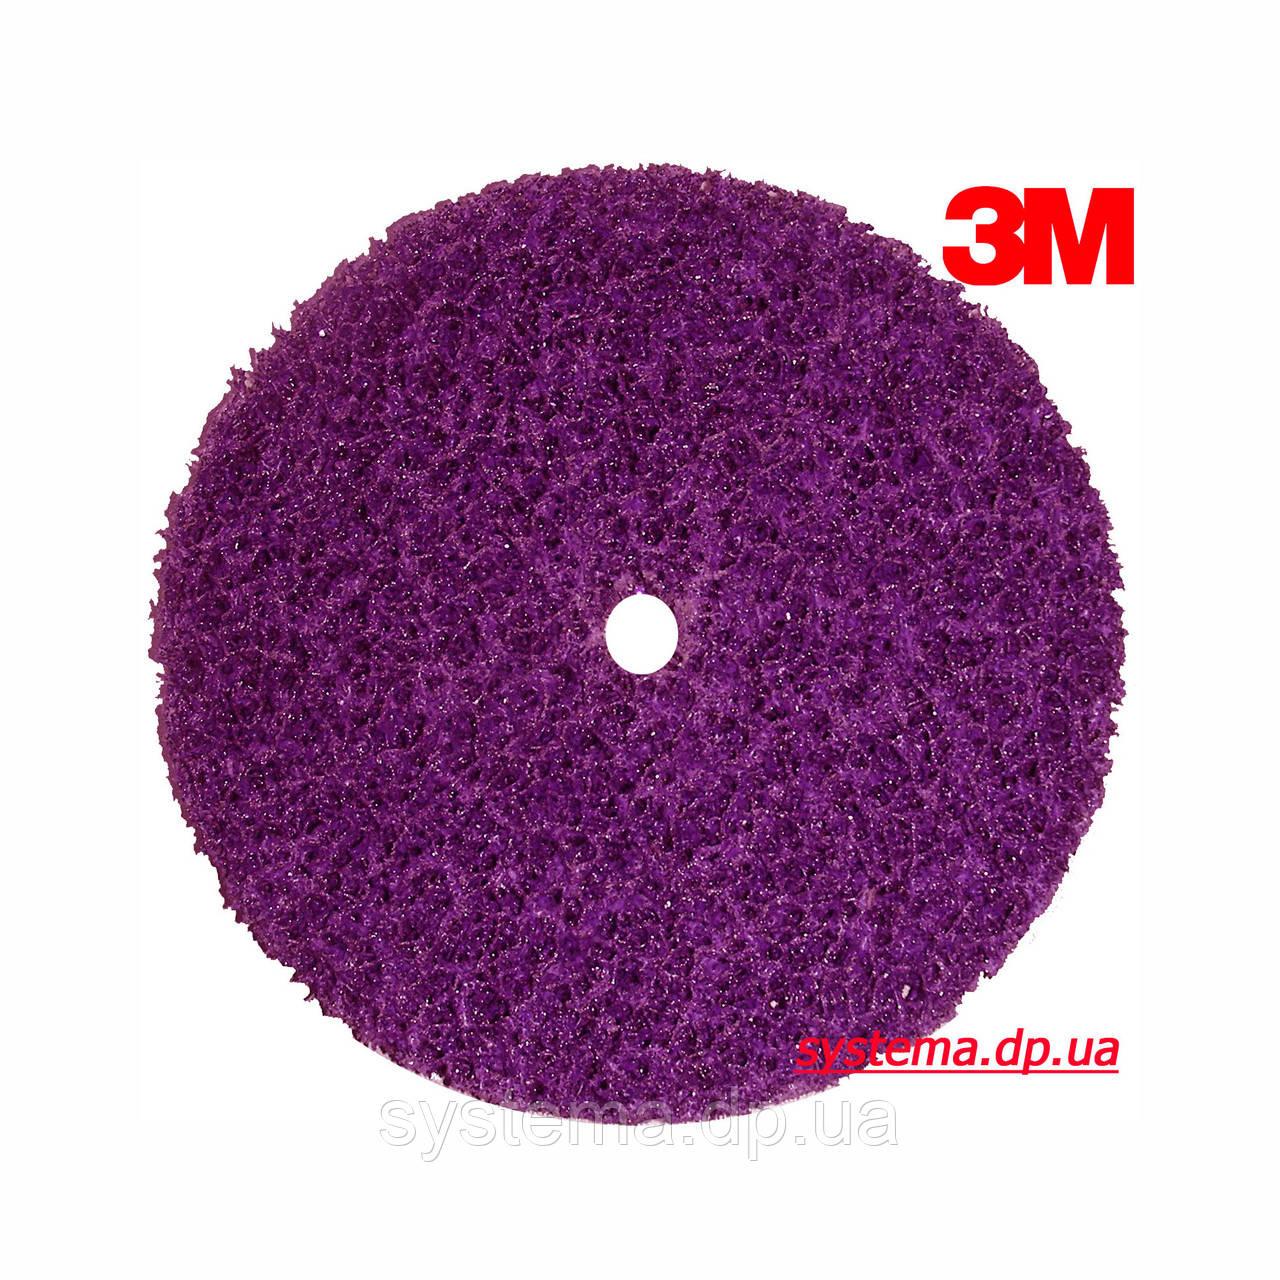 3М™ 07933 Scotch-Brite™ Clean&Strip XT-DC Purple™ - Зачистной круг 100 x 13 мм